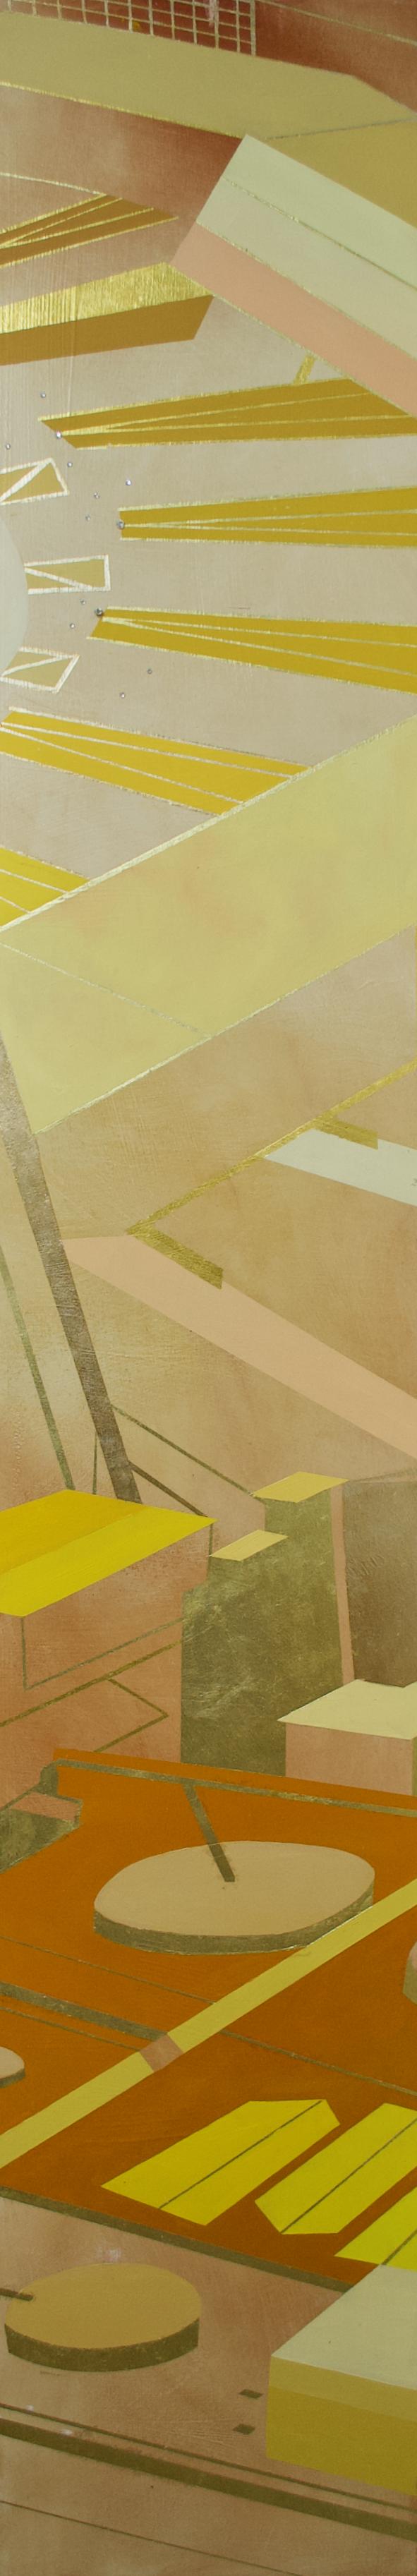 "Wonderwheel #29 - 60"" x 10"" oil and gold leaf on panel$1950"